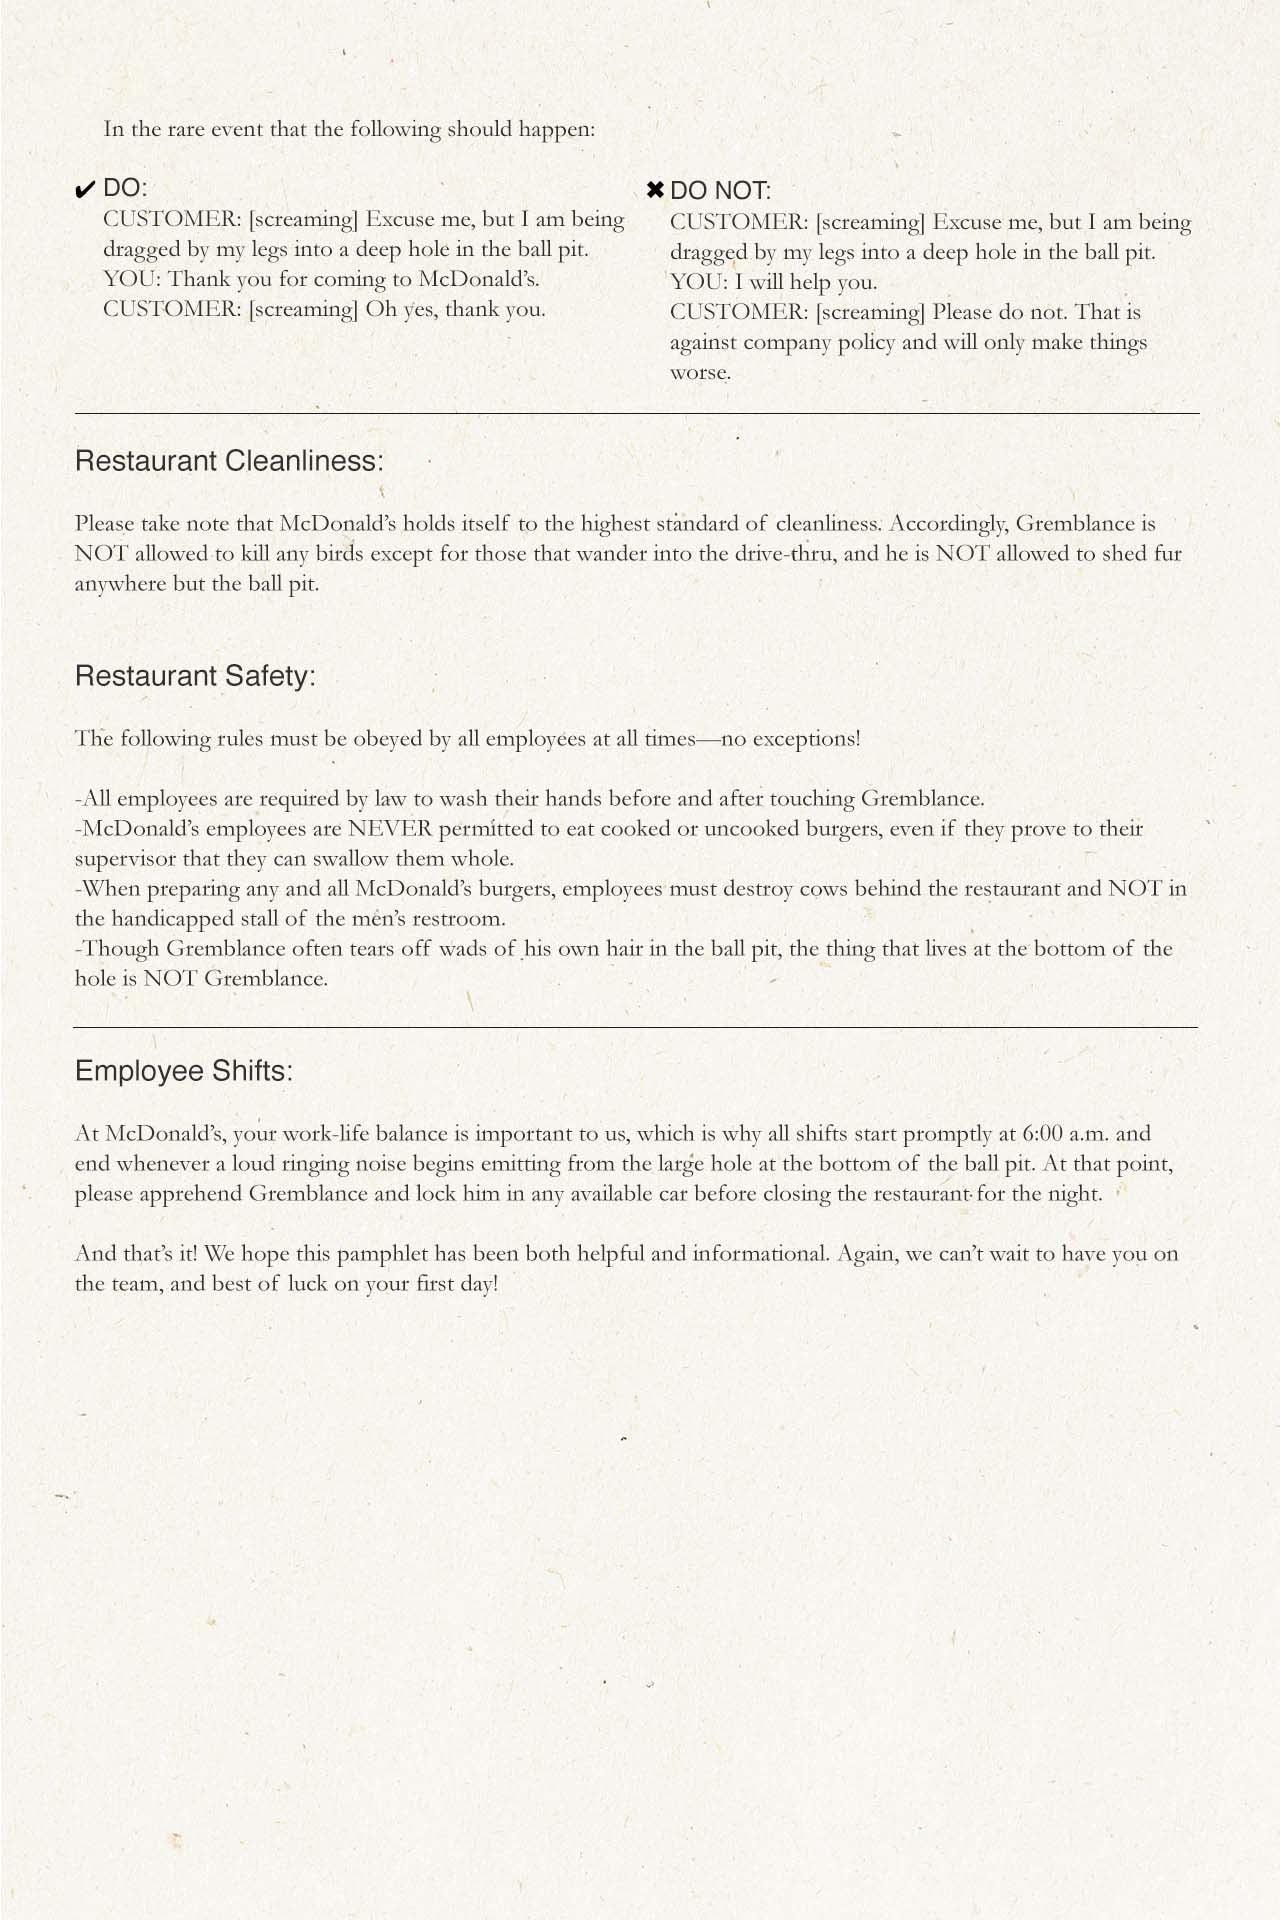 the original mcdonald s employee training manual is a must read rh lifestyle clickhole com mcdonald's canadian o&t manual No McDonald's